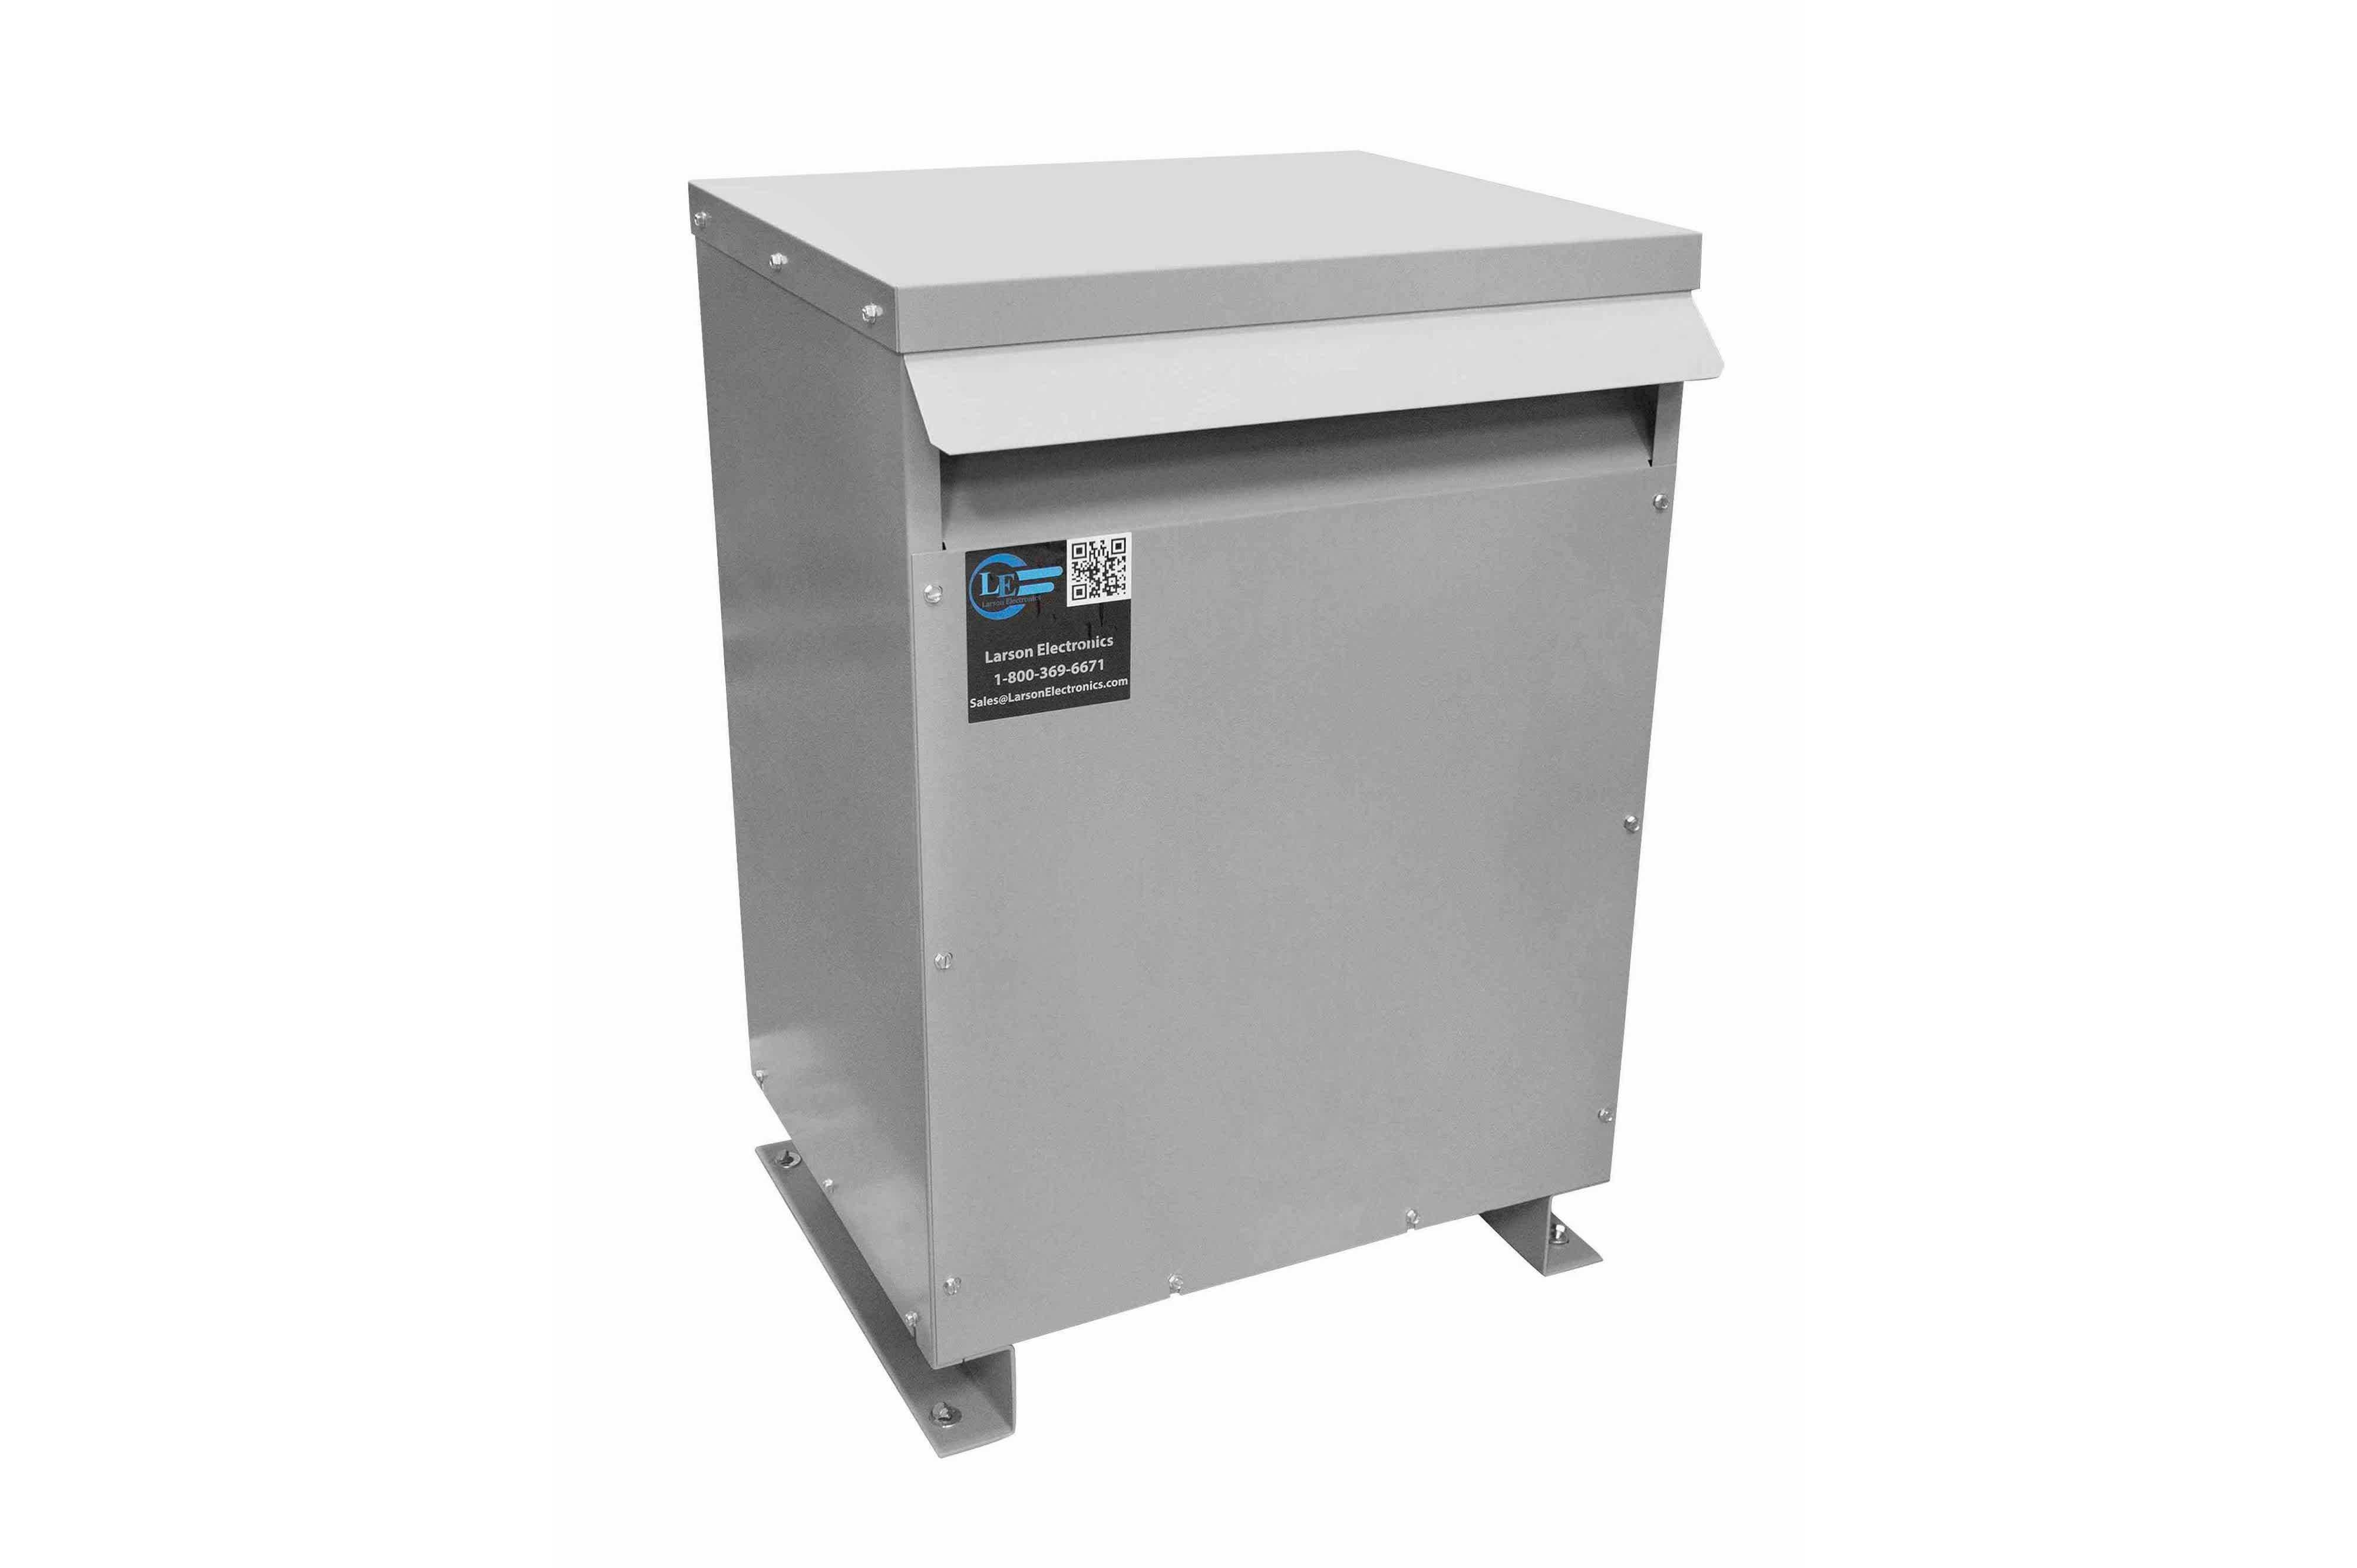 80 kVA 3PH Isolation Transformer, 415V Wye Primary, 600Y/347 Wye-N Secondary, N3R, Ventilated, 60 Hz